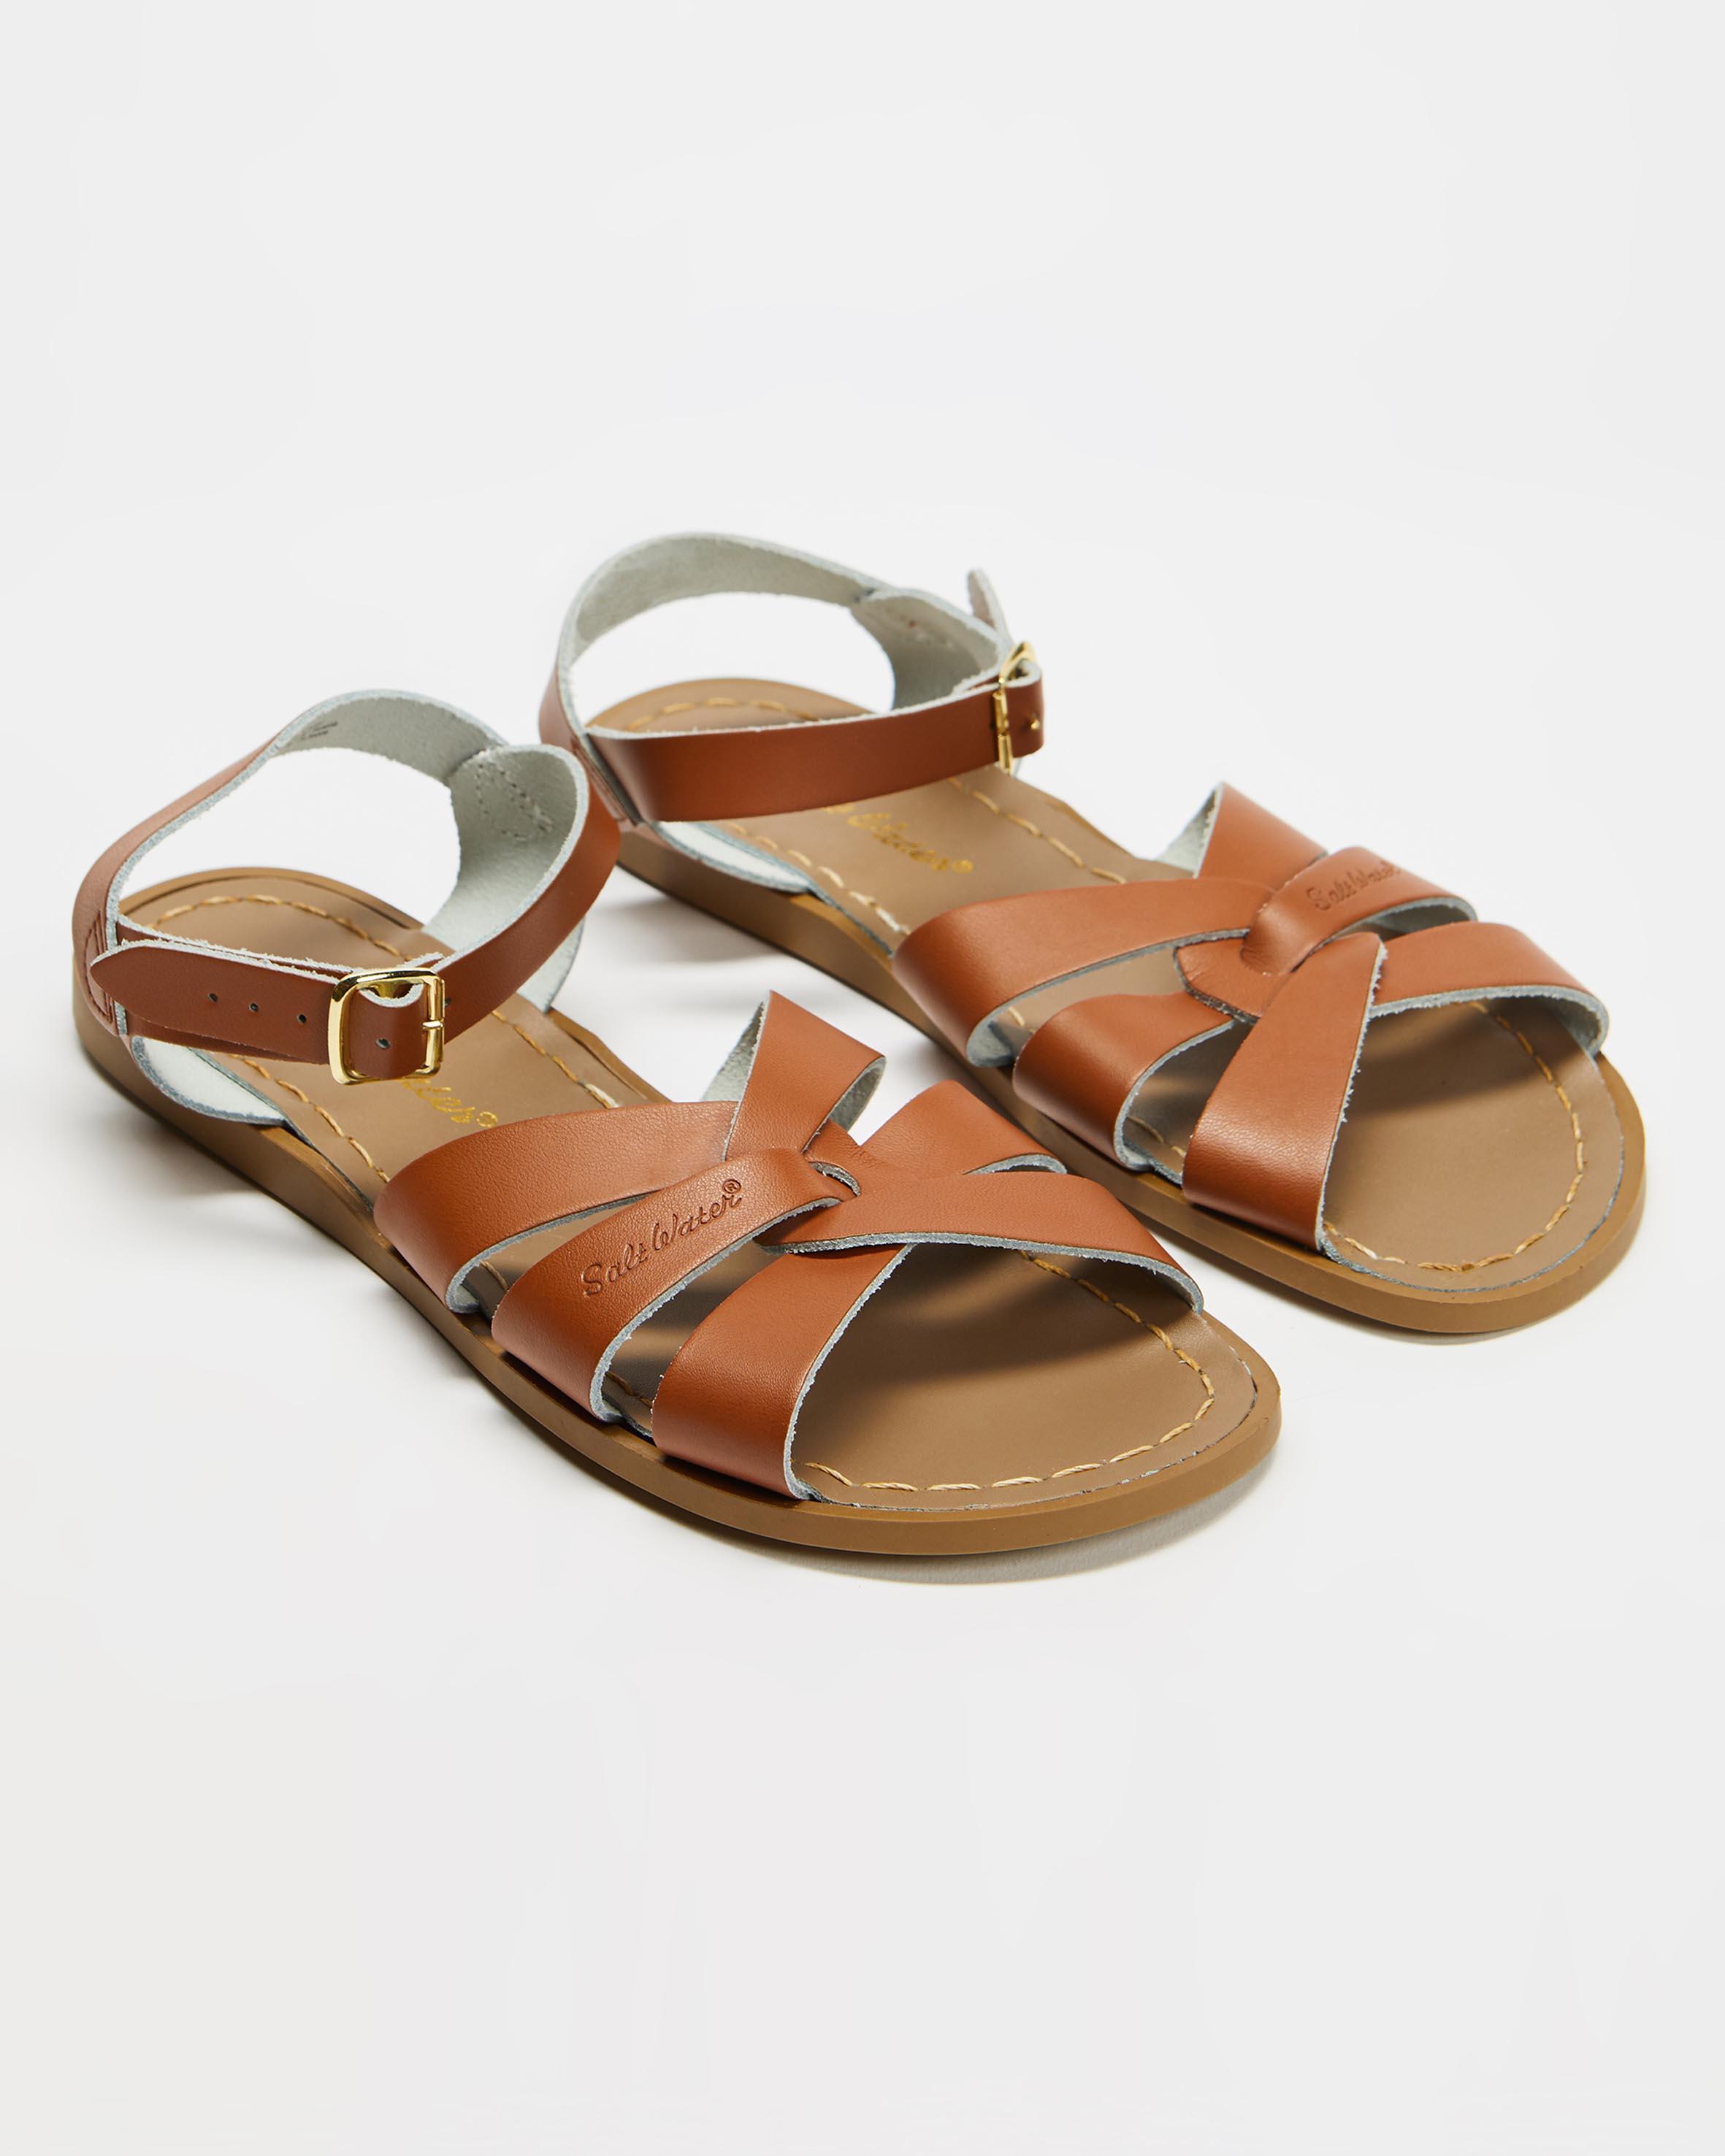 Hoy Shoe Company - Sun San Salt Water Sandals